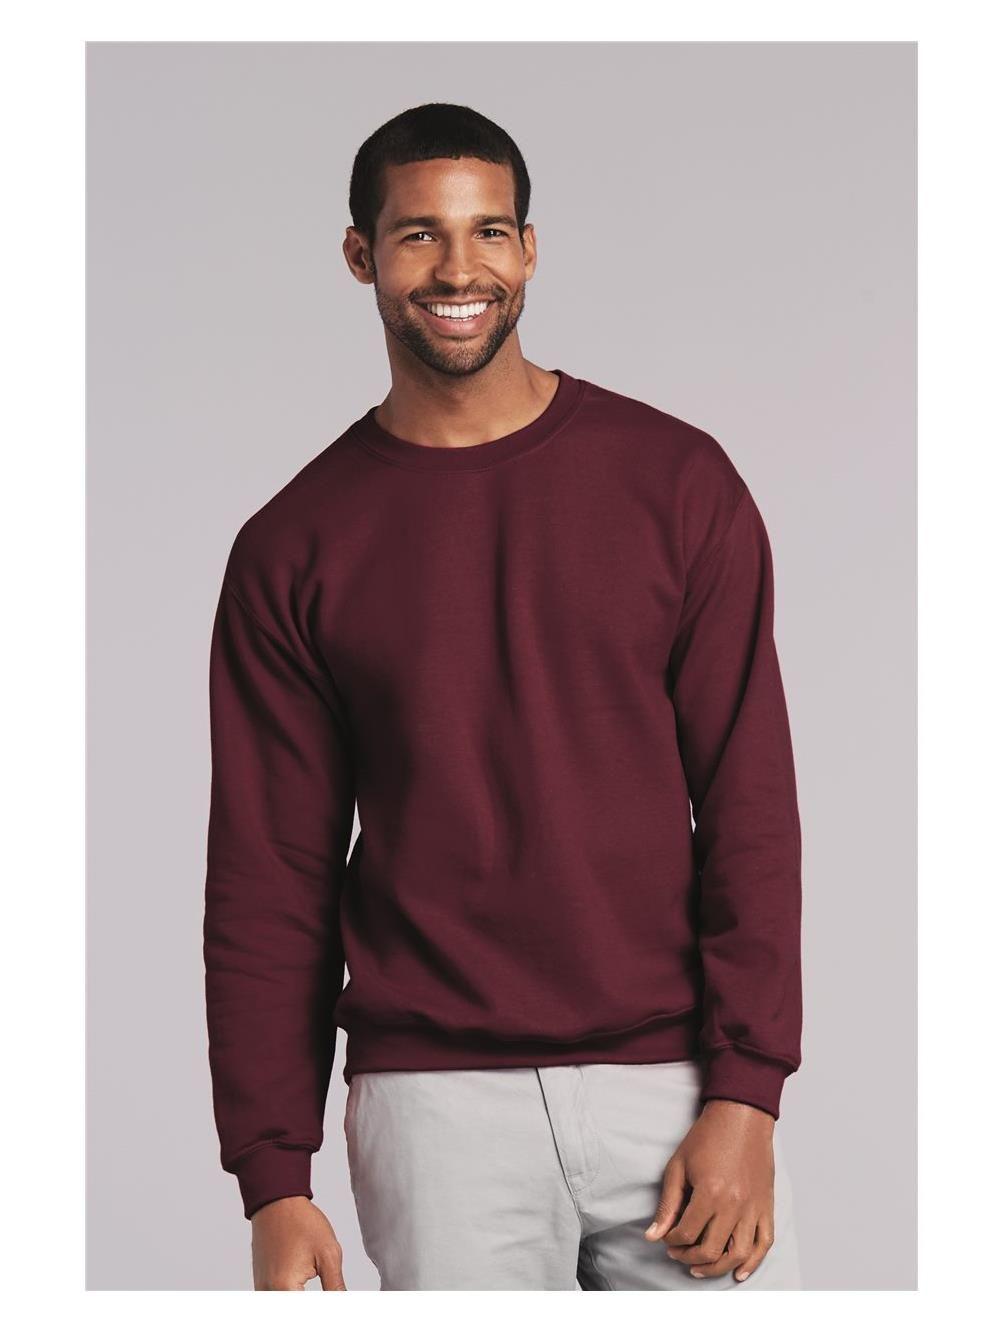 Gildan Gildan New Nib Men Heavy Blend Crewneck Sweatshirt Walmart Com Long Sleeve Tshirt Men Gildan Sweatshirts Crew Neck Sweatshirt [ 1333 x 1000 Pixel ]